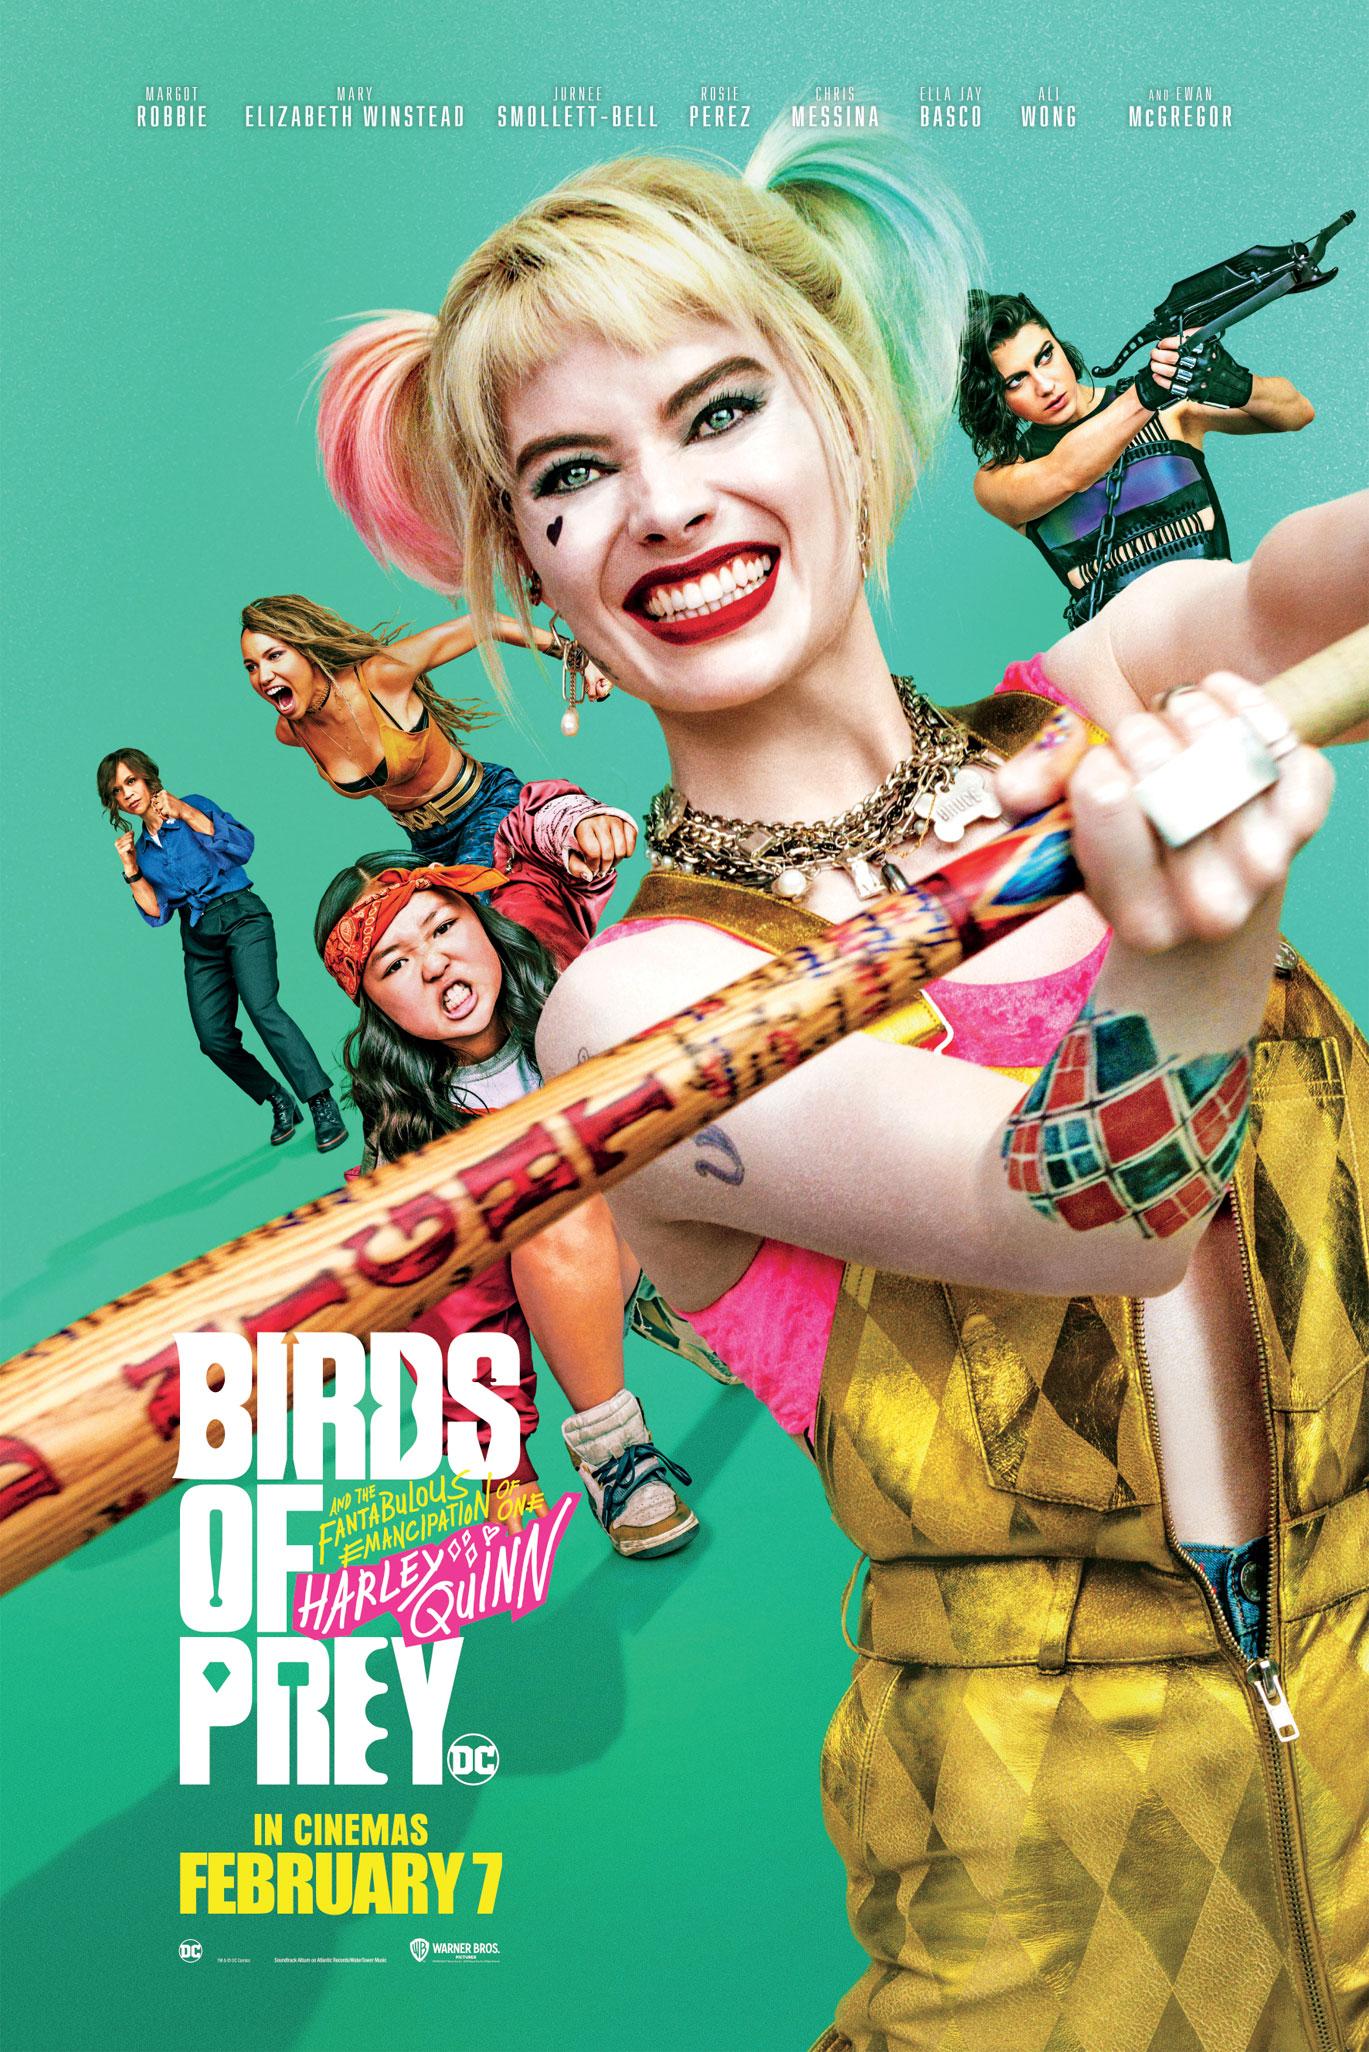 REVIEW: BIRDS OF PREY